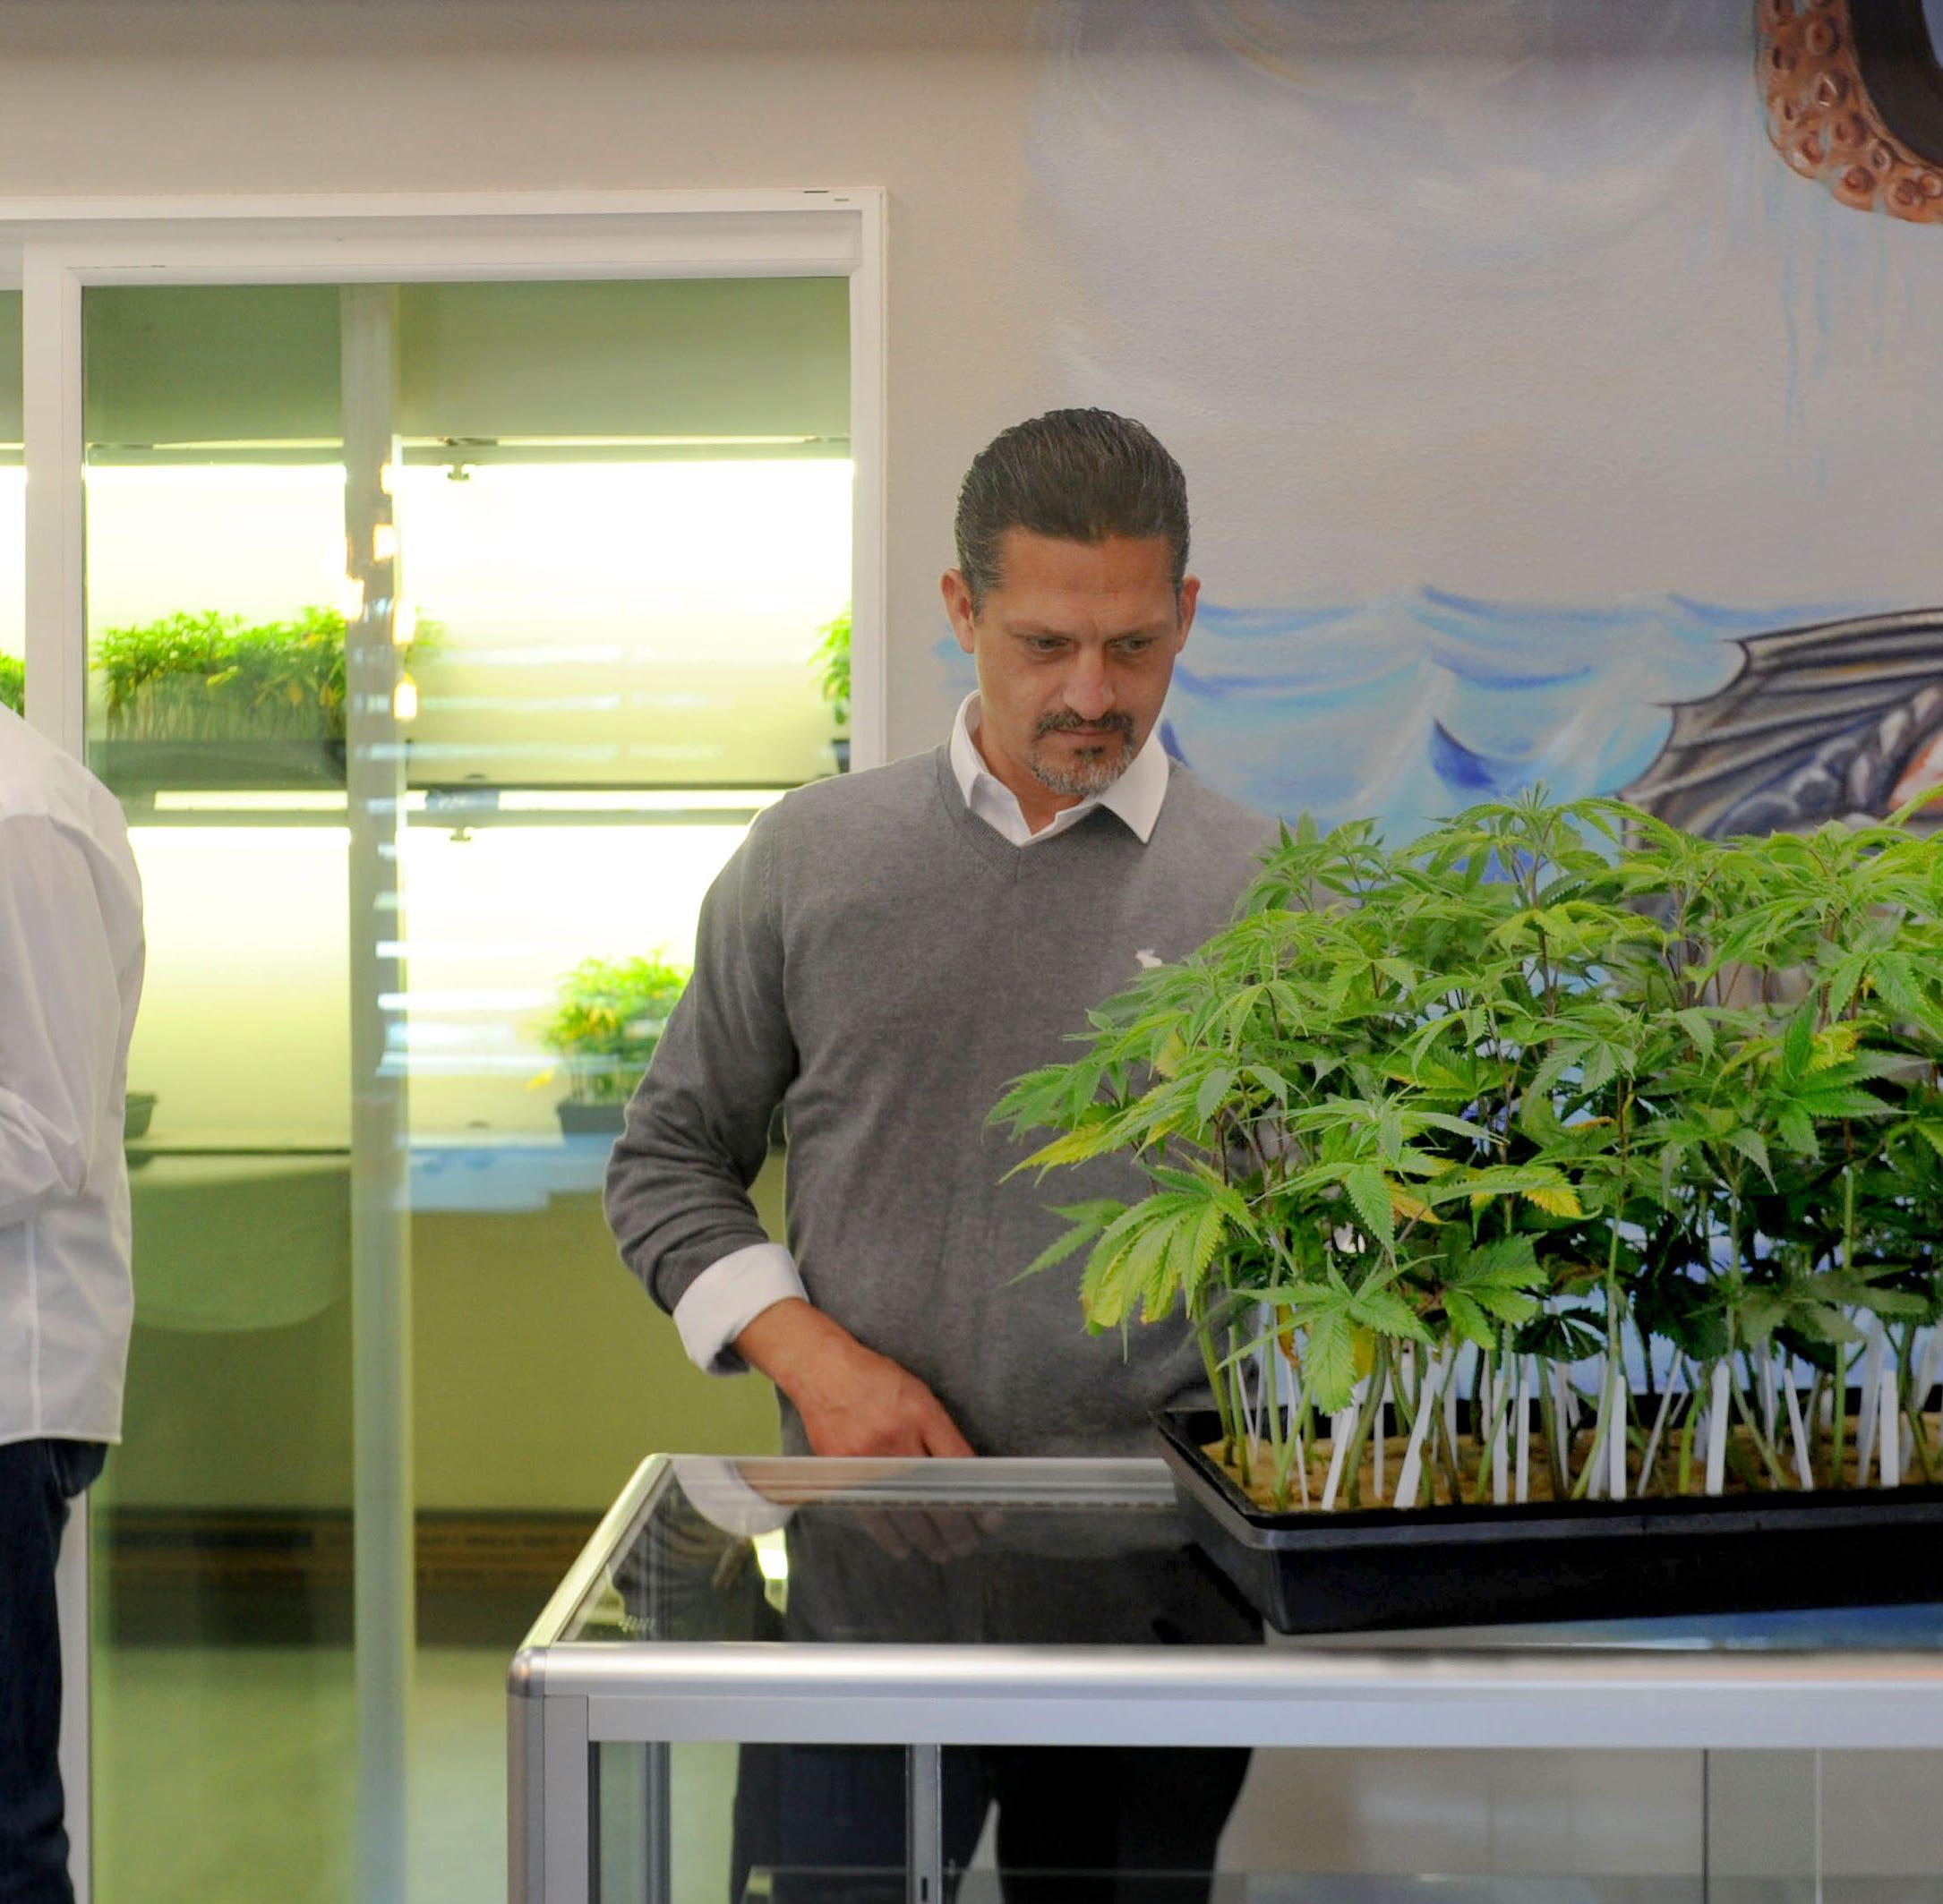 Port Hueneme's marijuana industry has commercial property values blazing